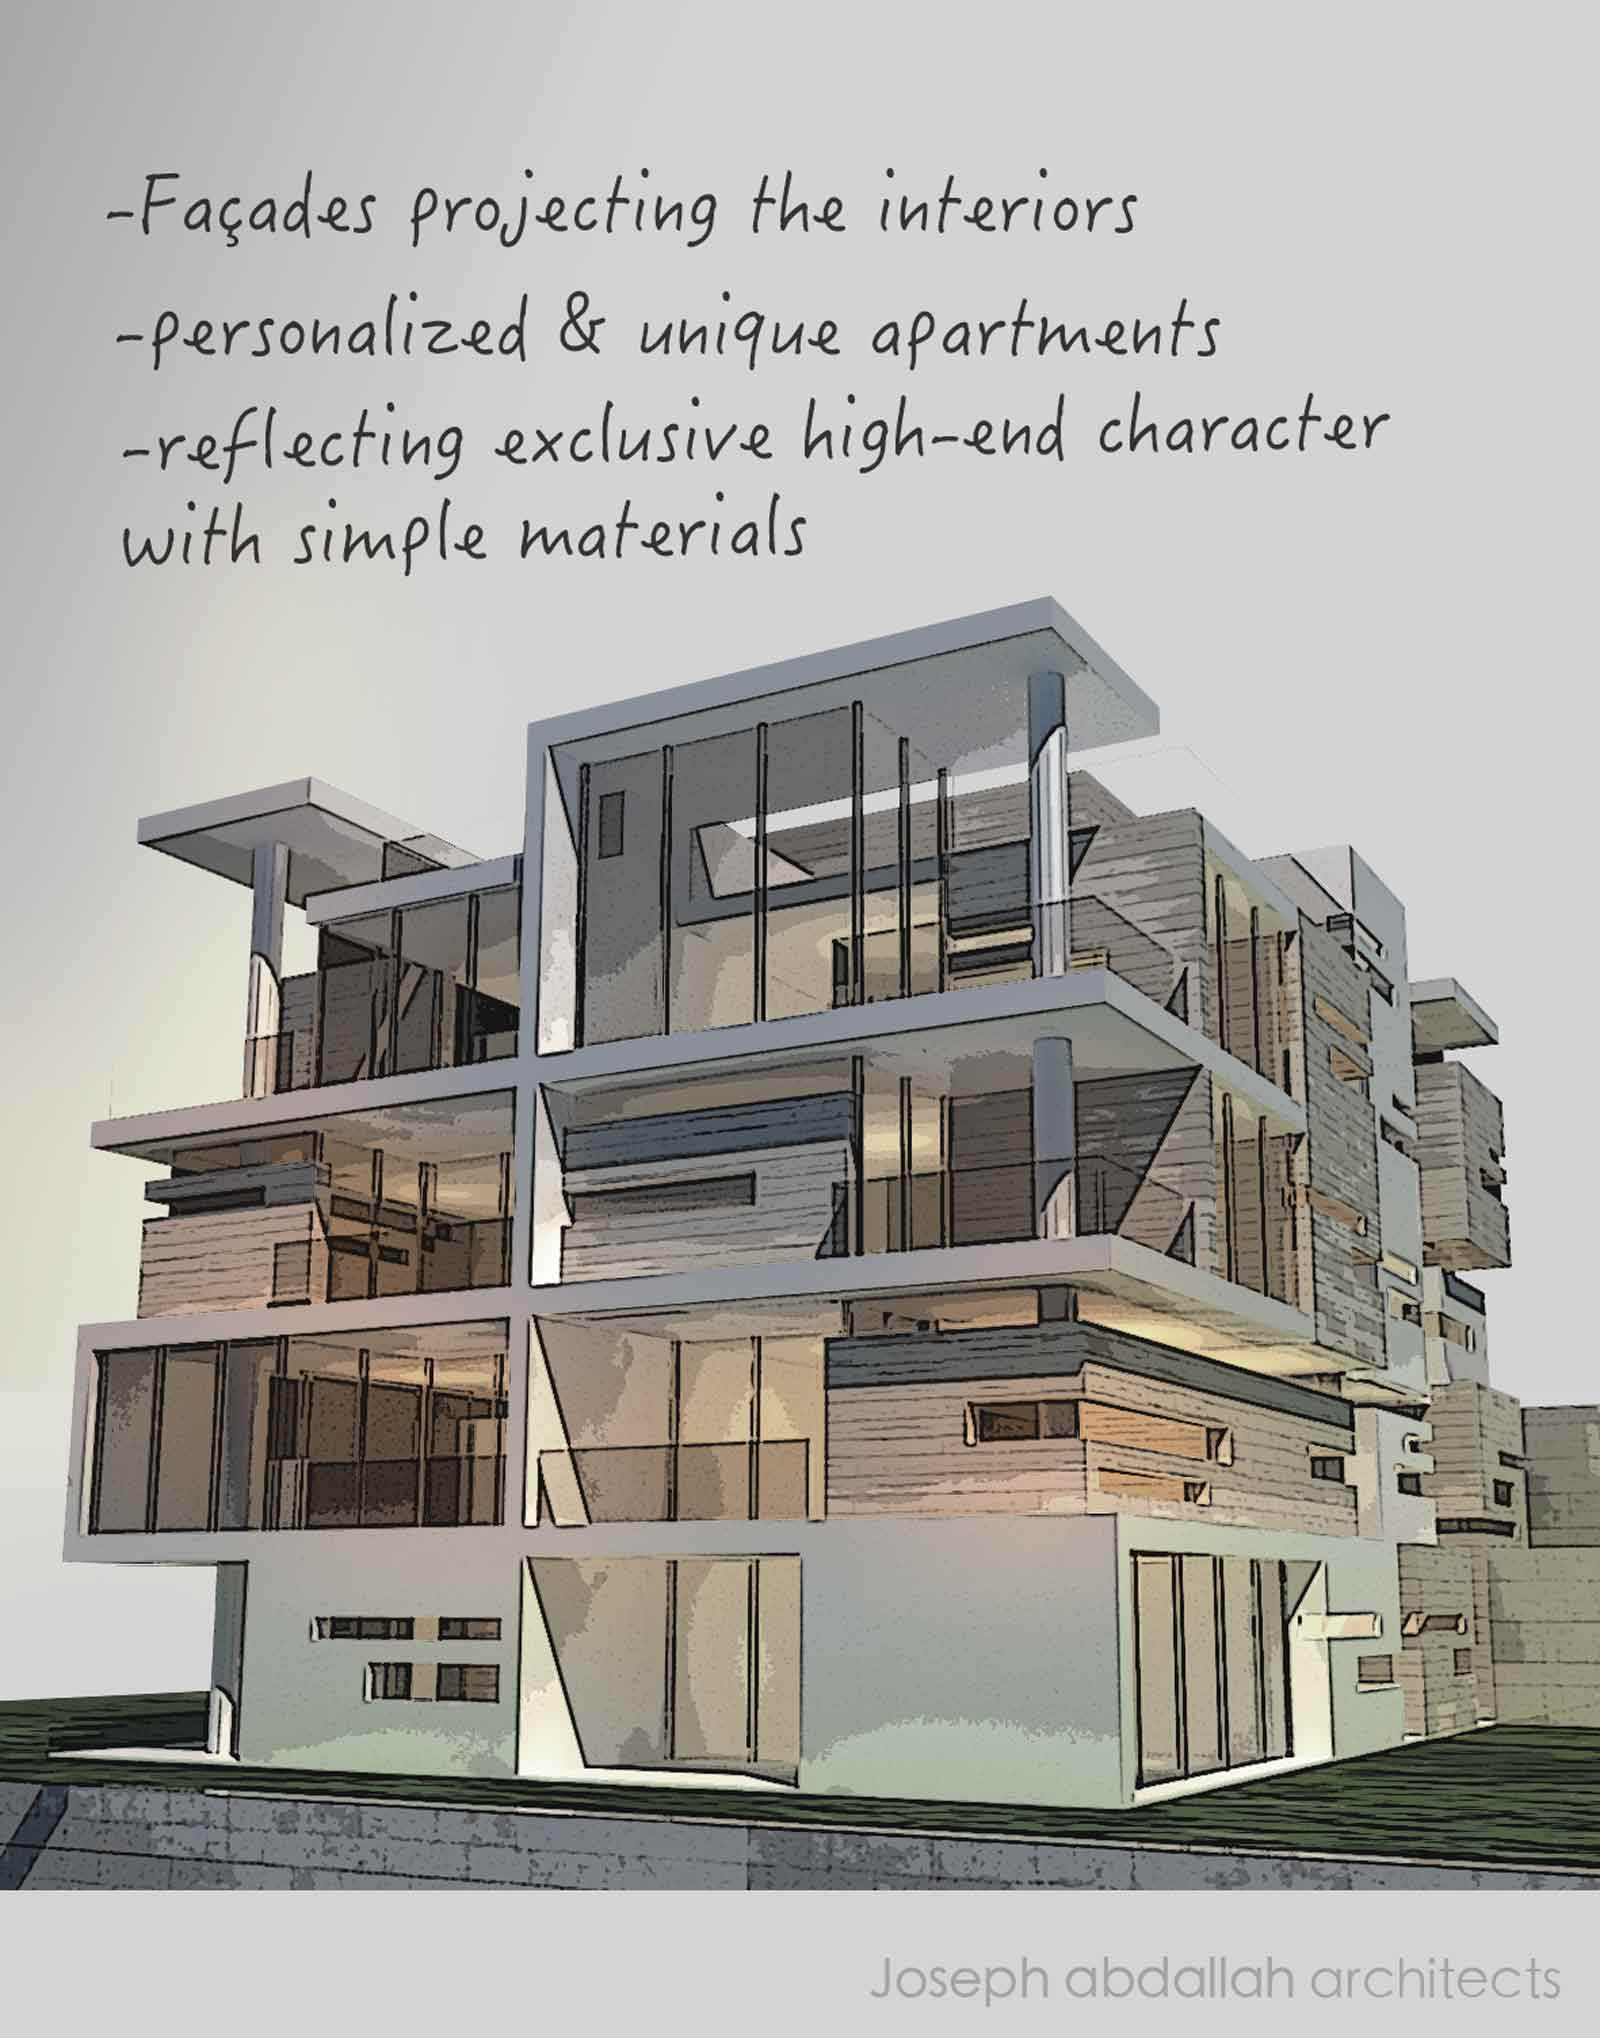 residence-building-modern-architecture-lebanon-joseph-abdallah-architects-1